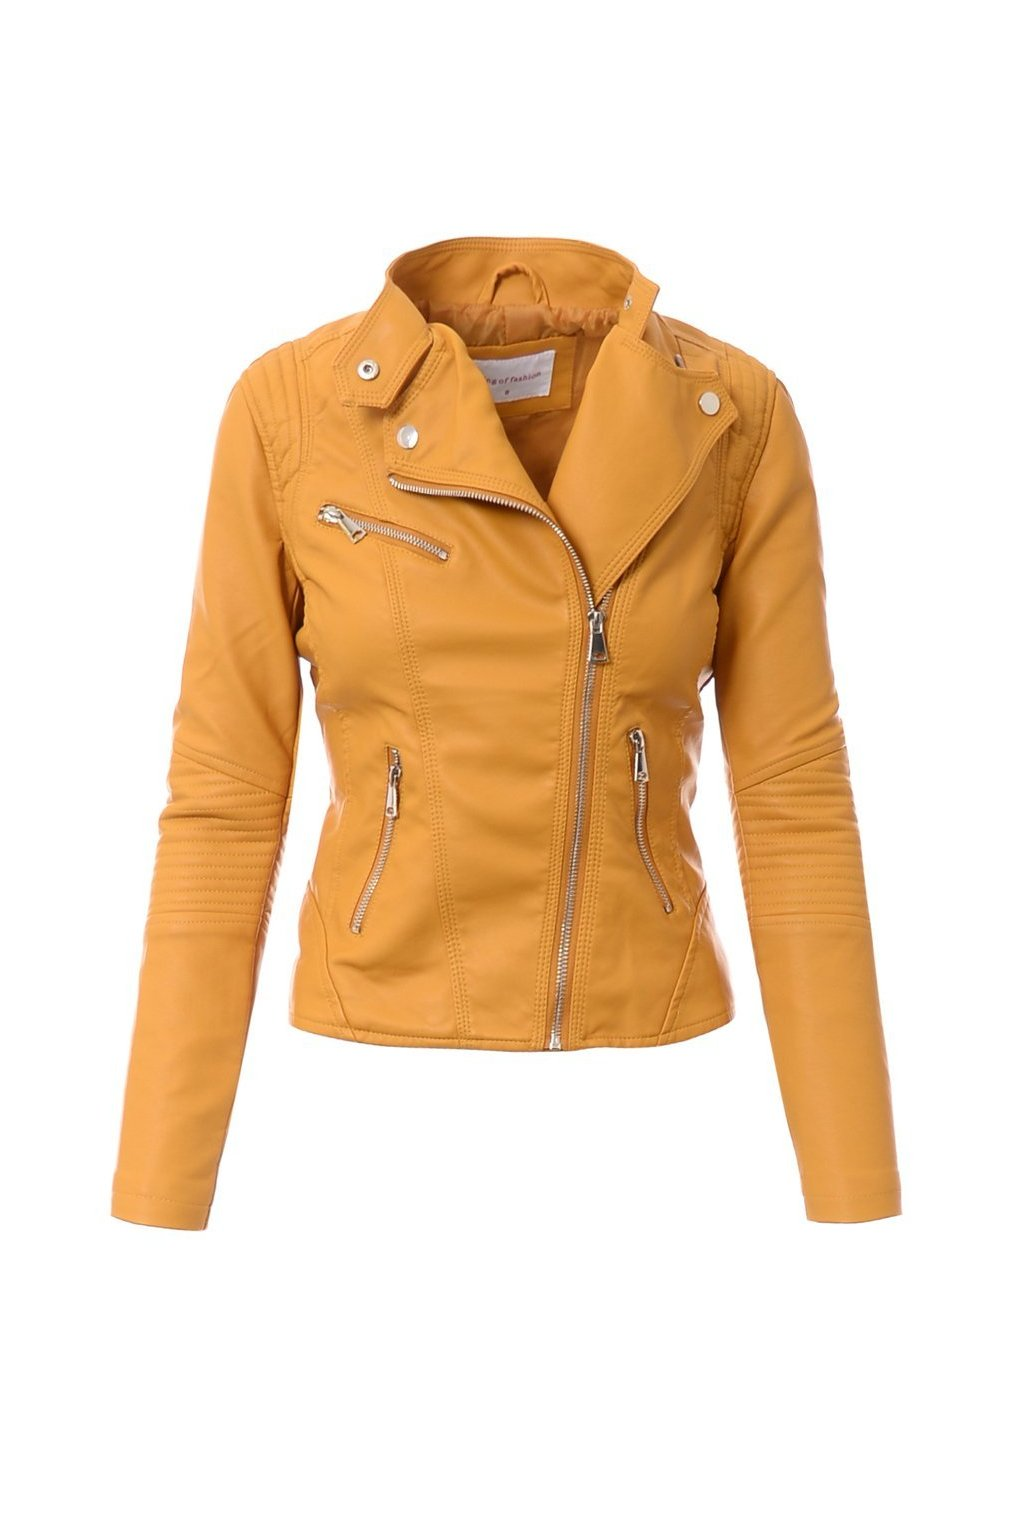 Dámska kožená bunda biker 4102 žltá